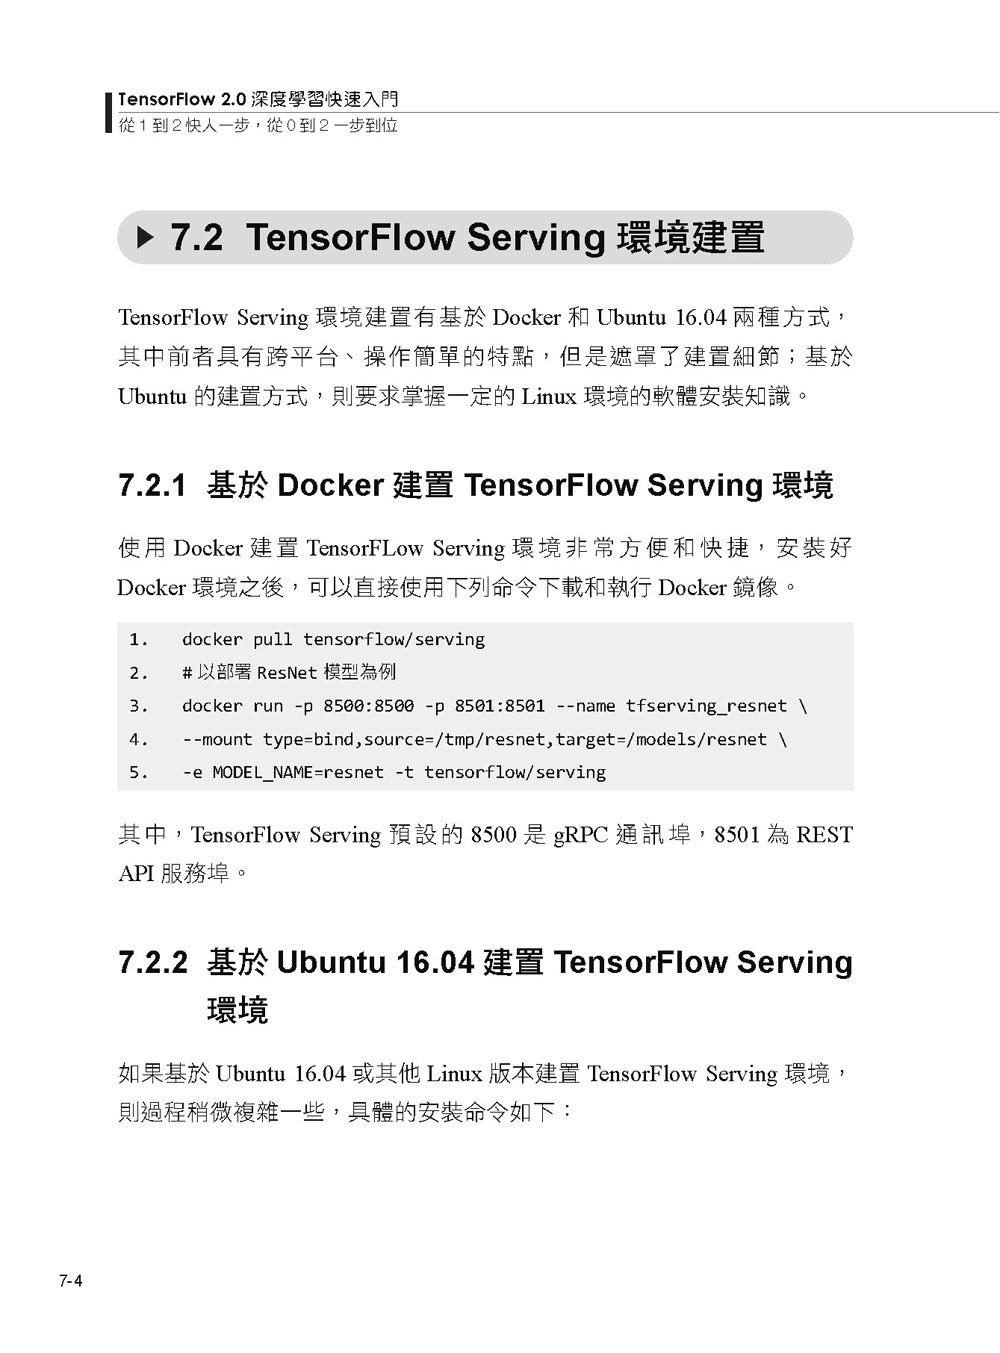 TensorFlow 2.0 深度學習快速入門:從1到2快人一步,從0到2一步到位-preview-13